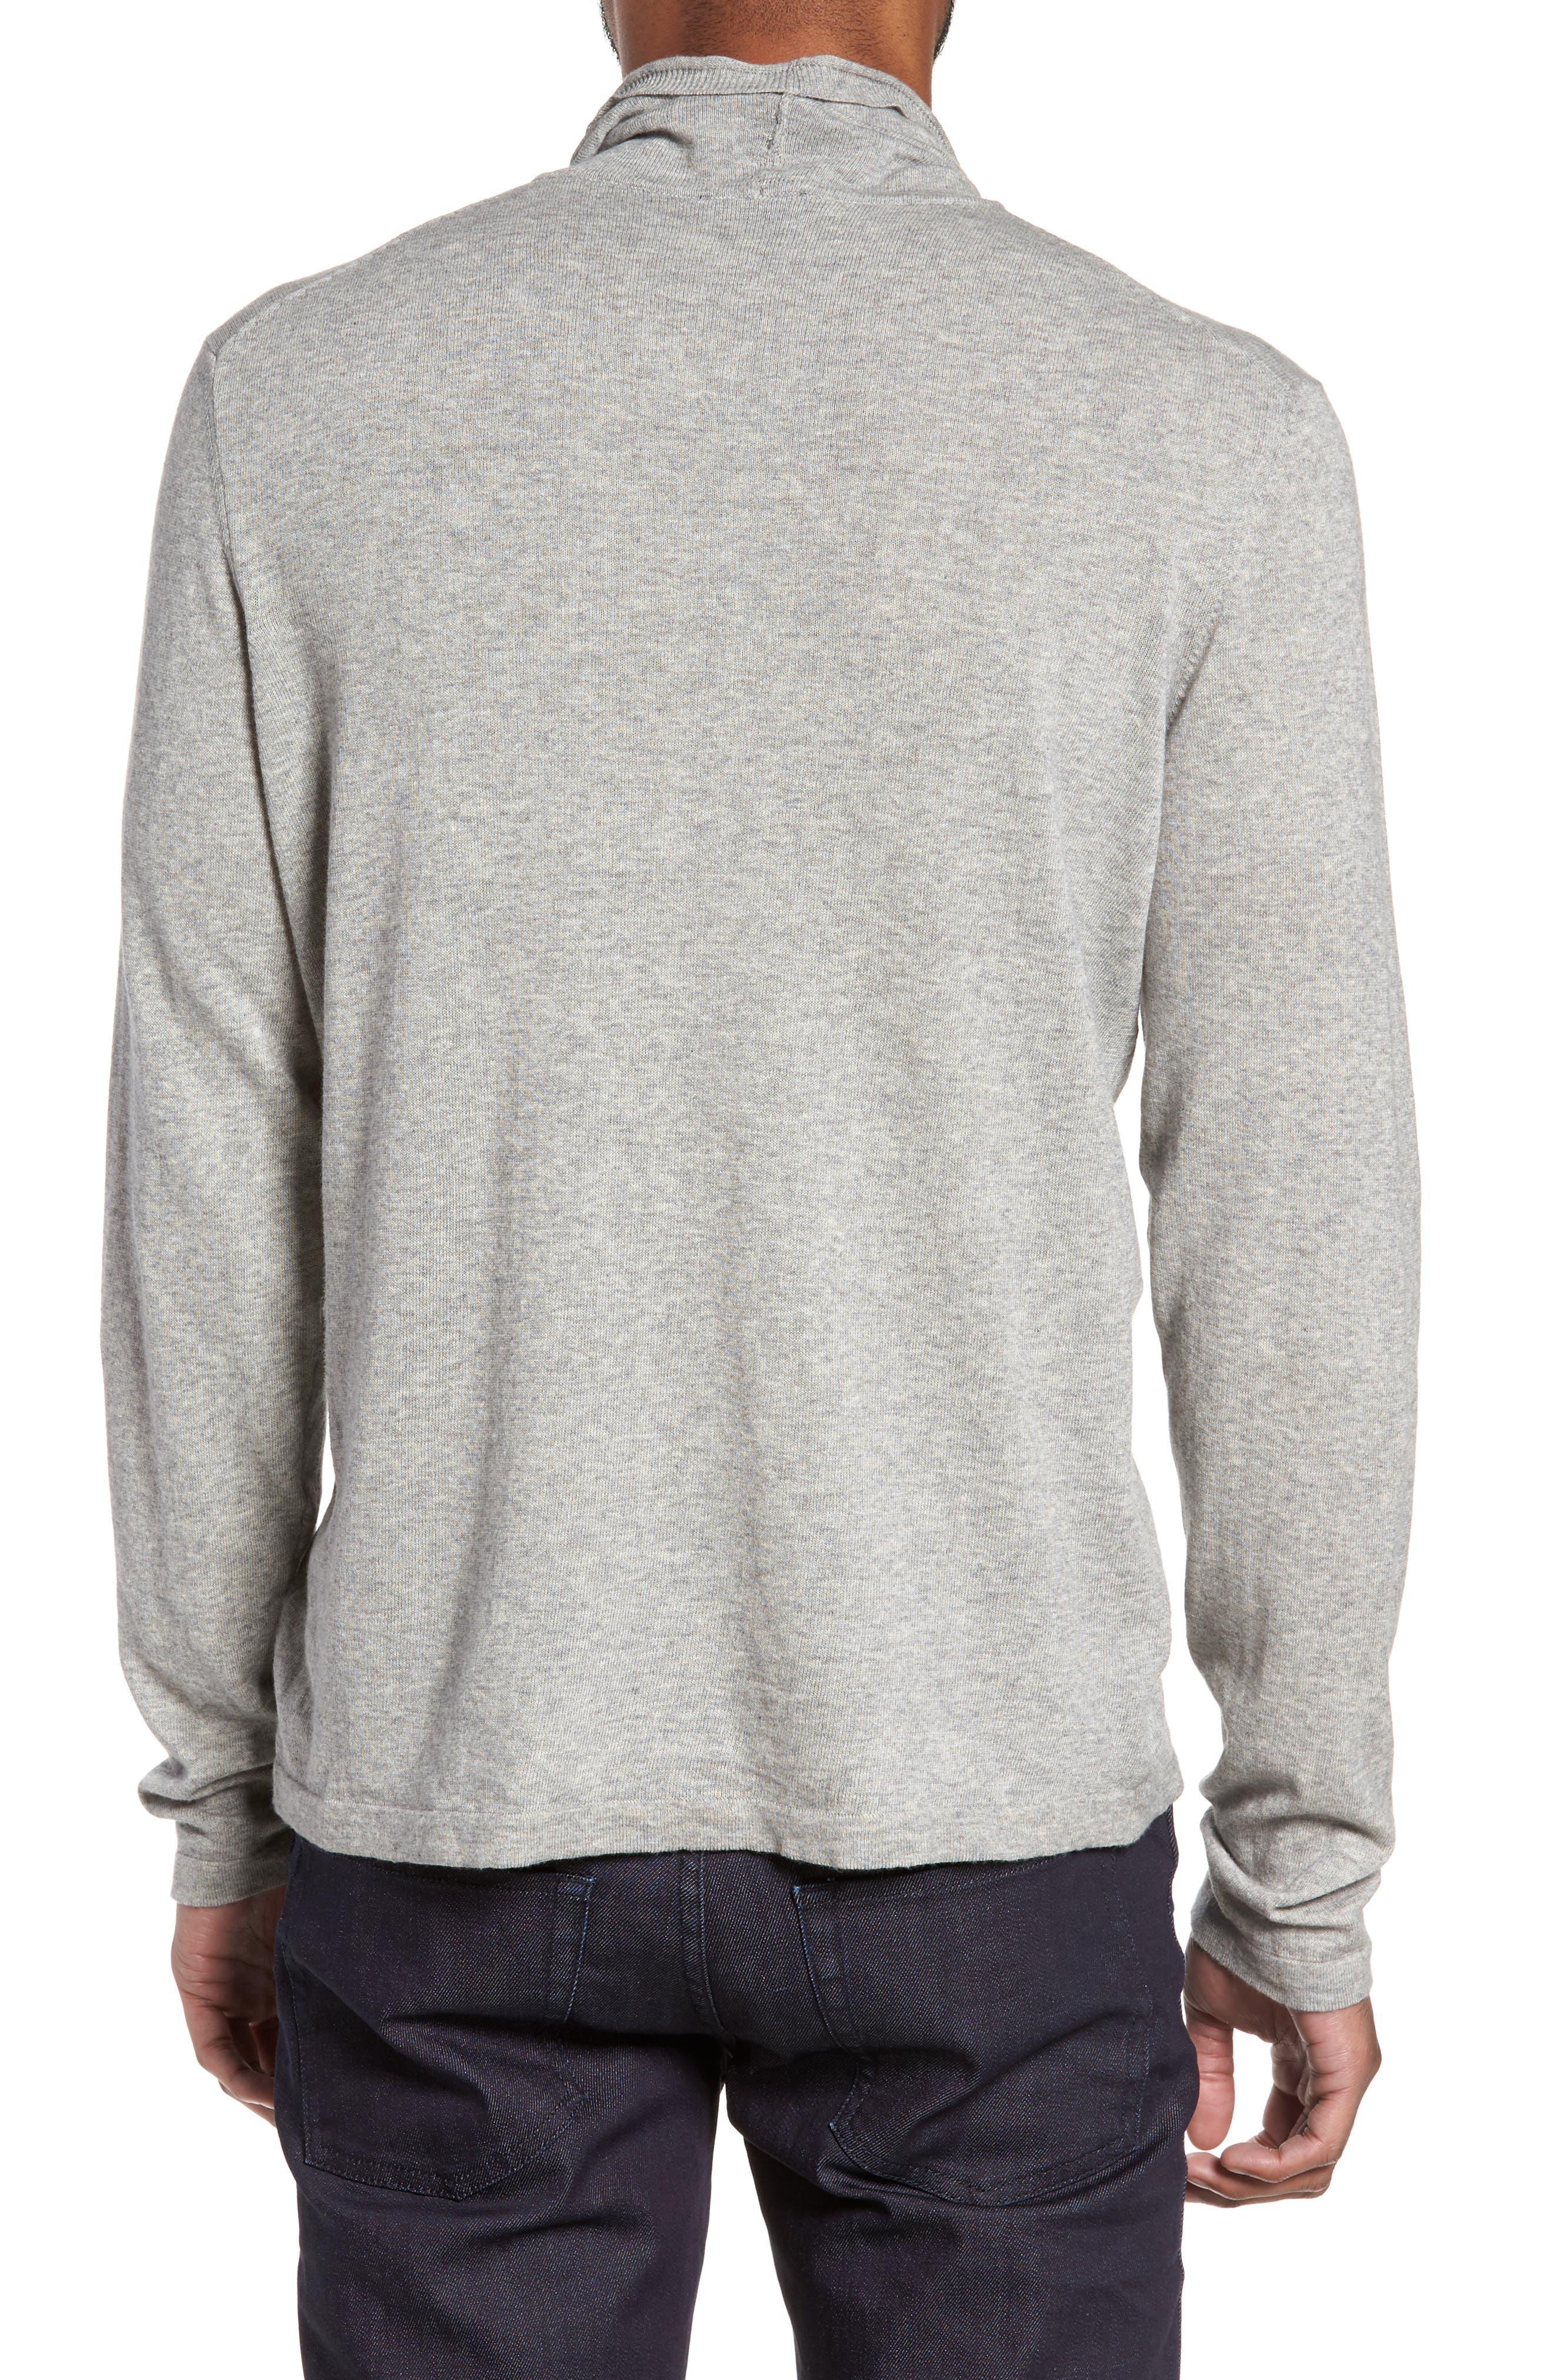 Hess Wool Turtleneck Sweater,                             Alternate thumbnail 3, color,